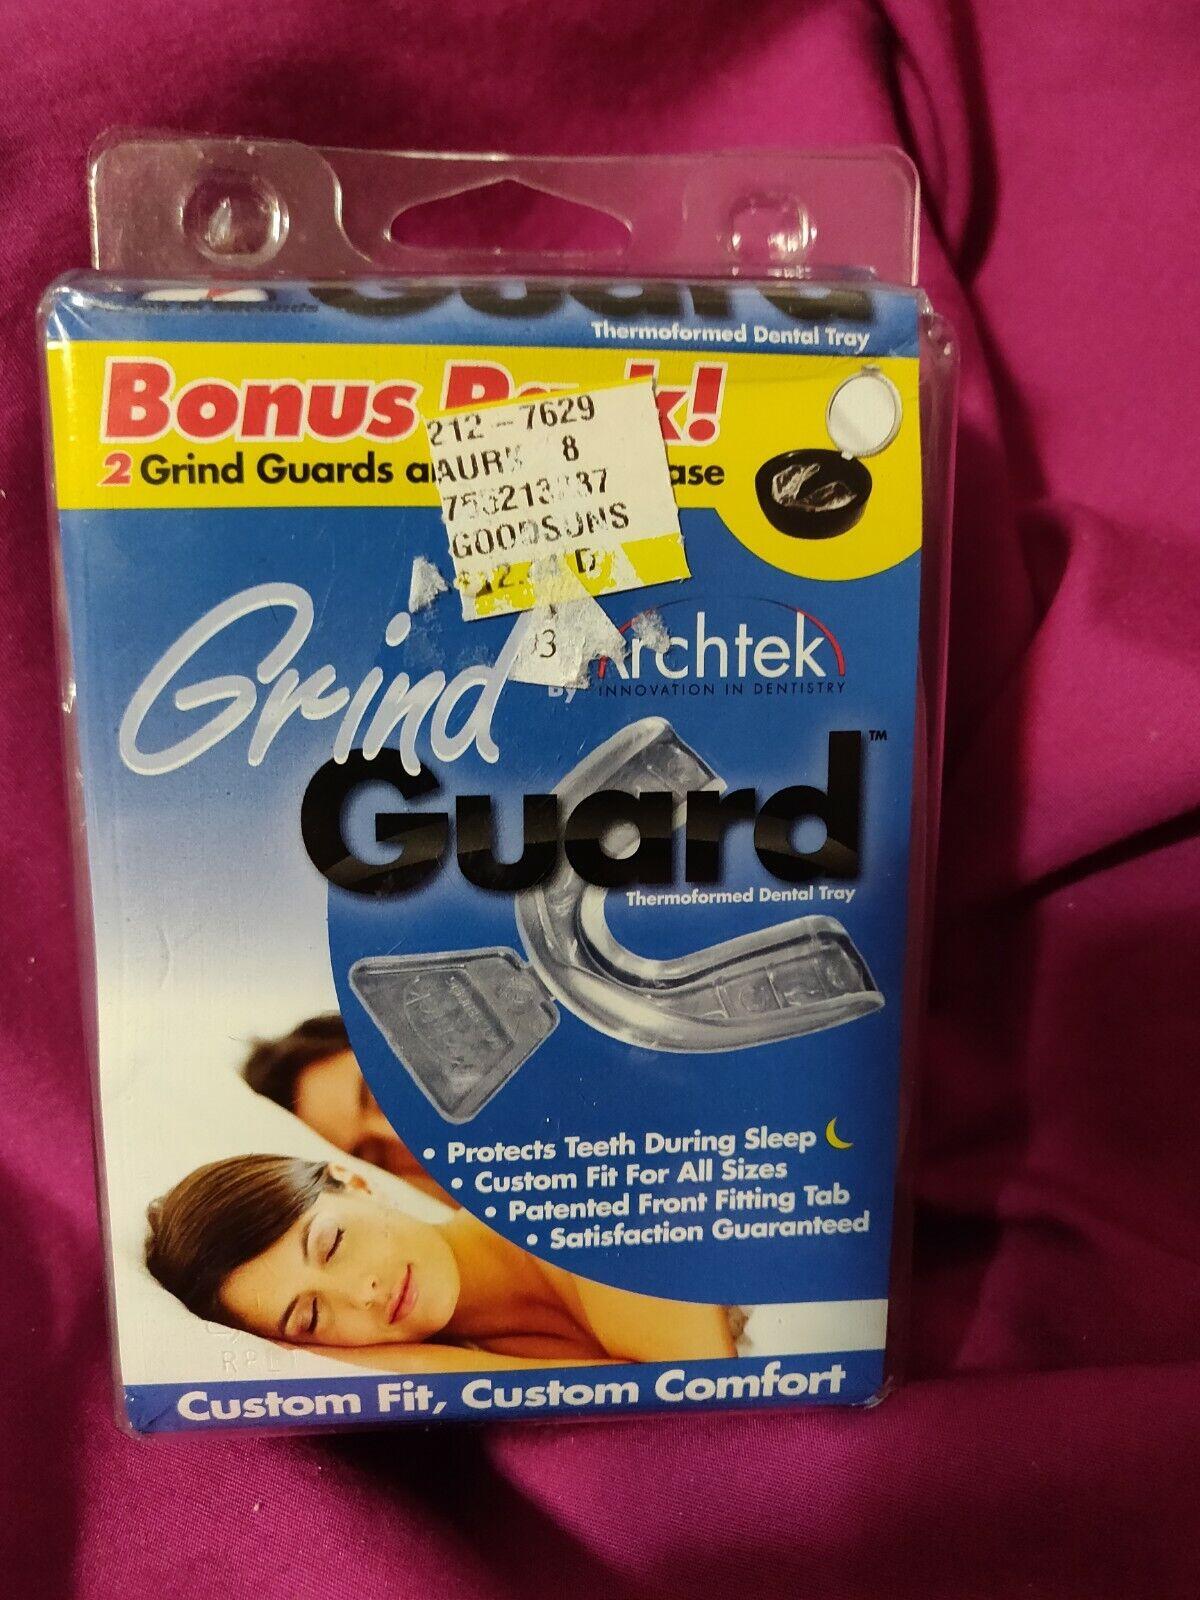 2 for 1 Bonus Pack! Grind Guard - Relieves Symptoms Associat